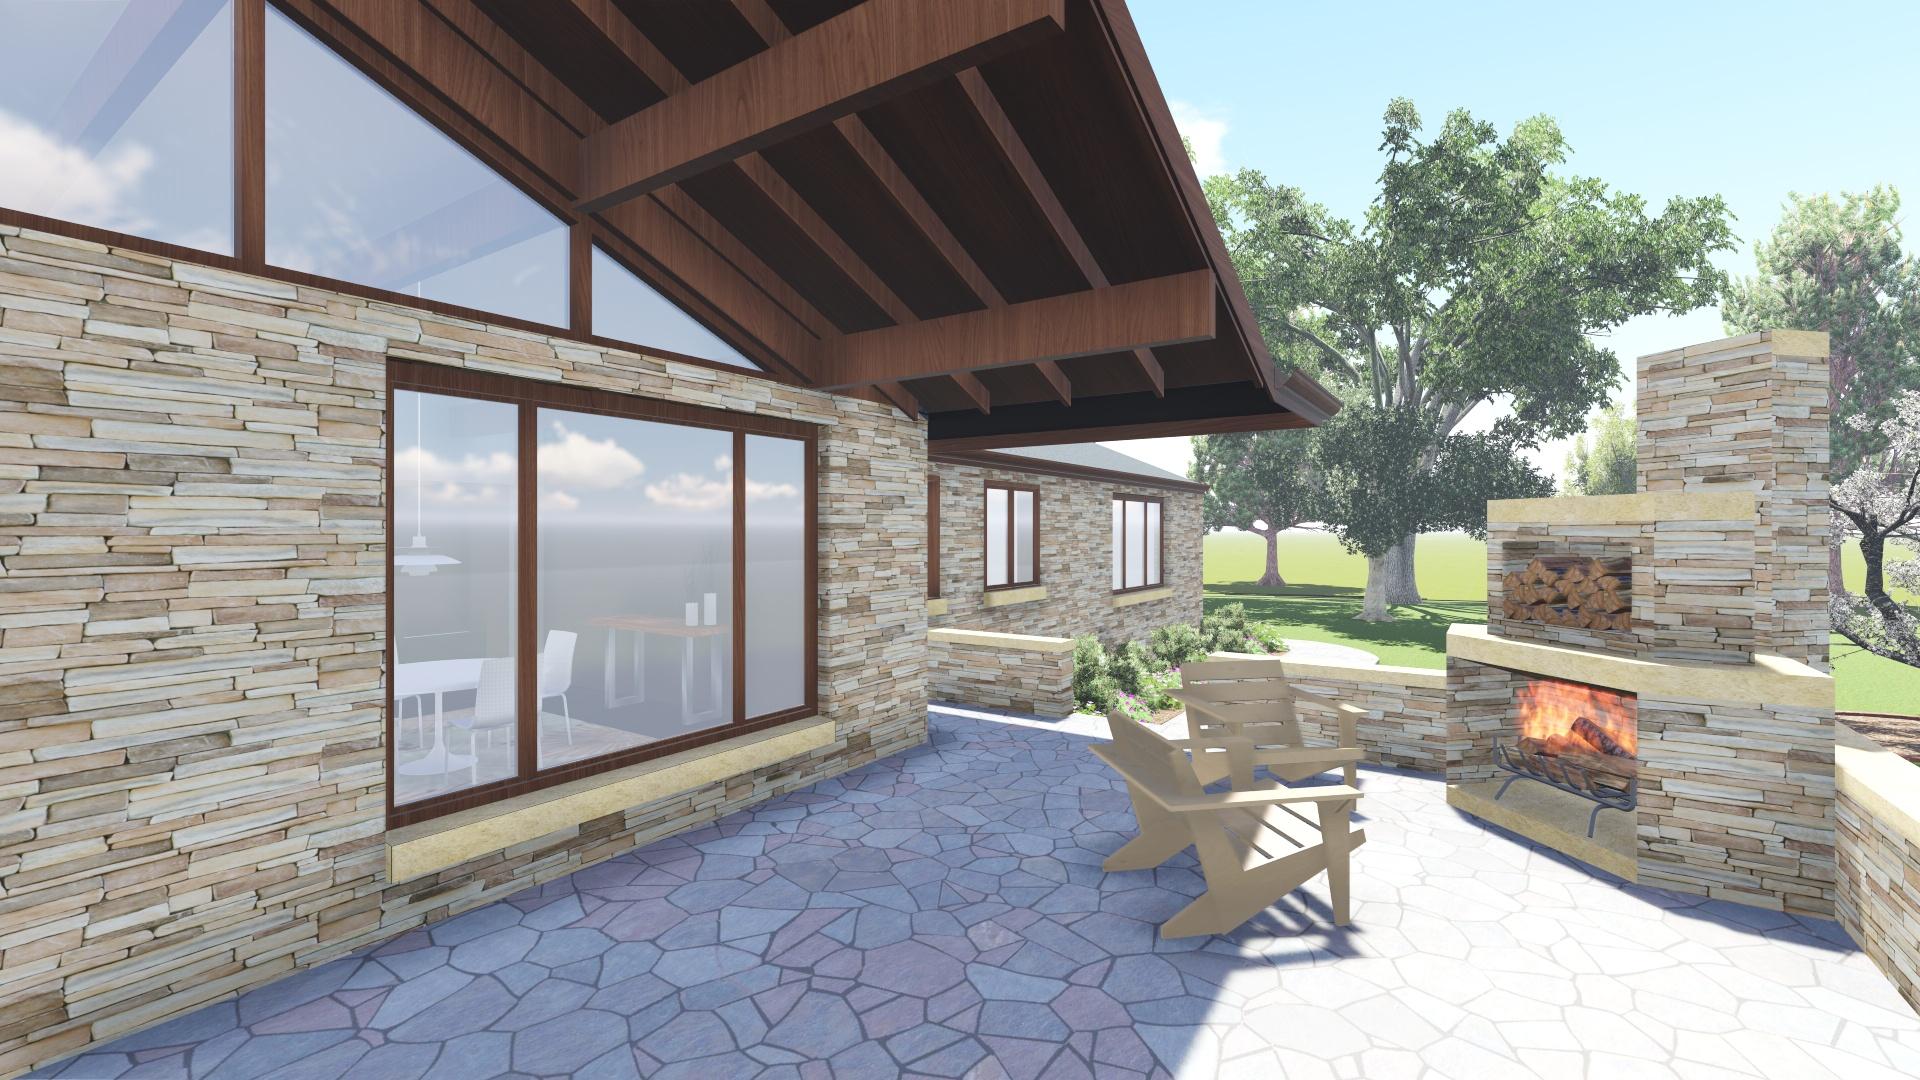 PROCESS: Schematic Design Proposal